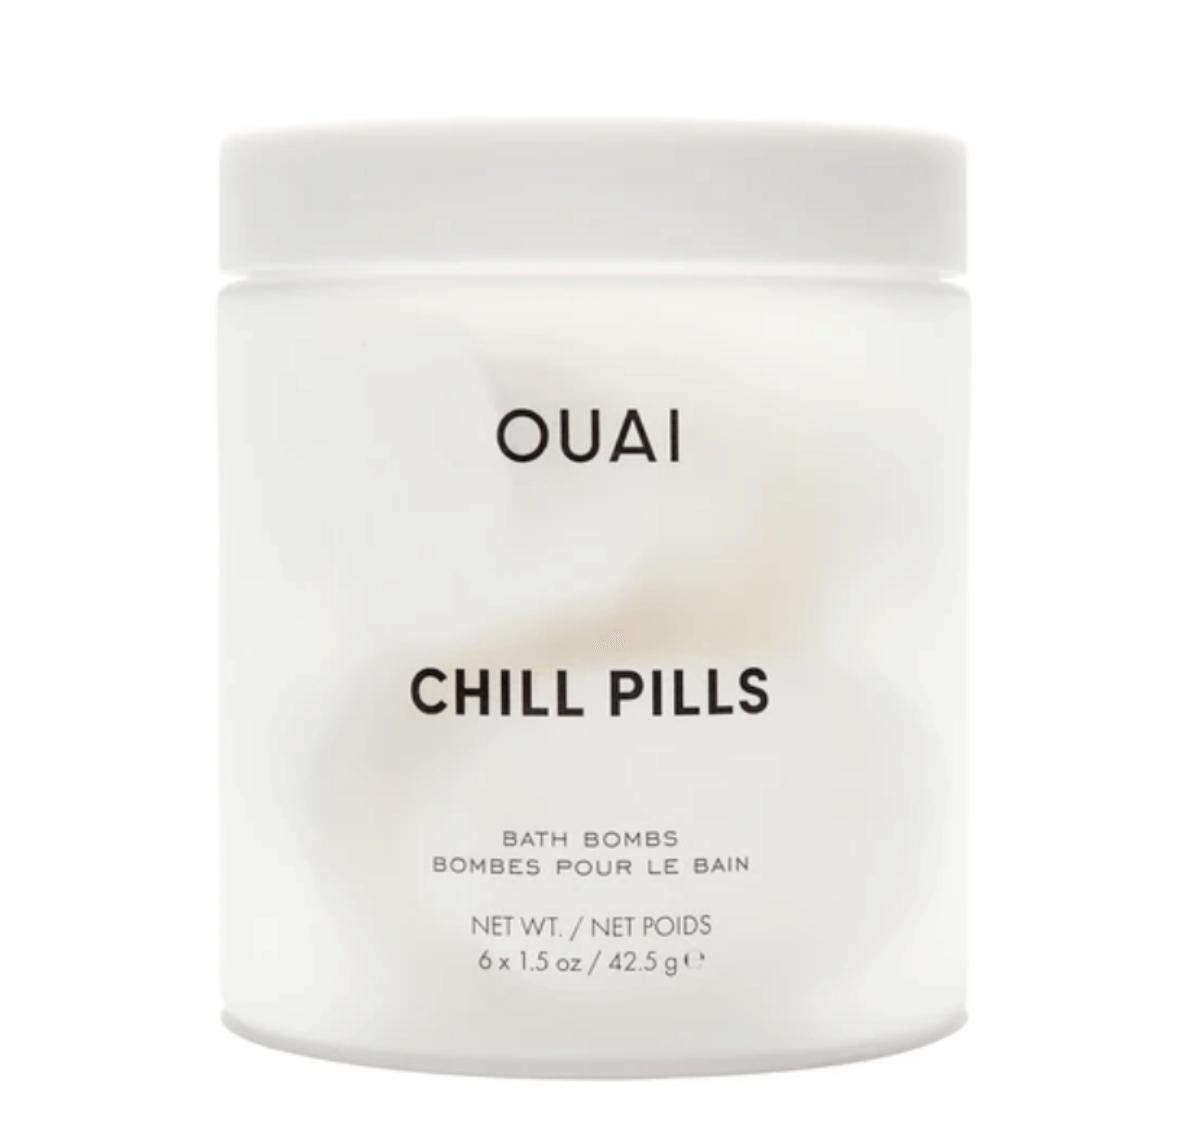 the ouai chill pills bath bombs